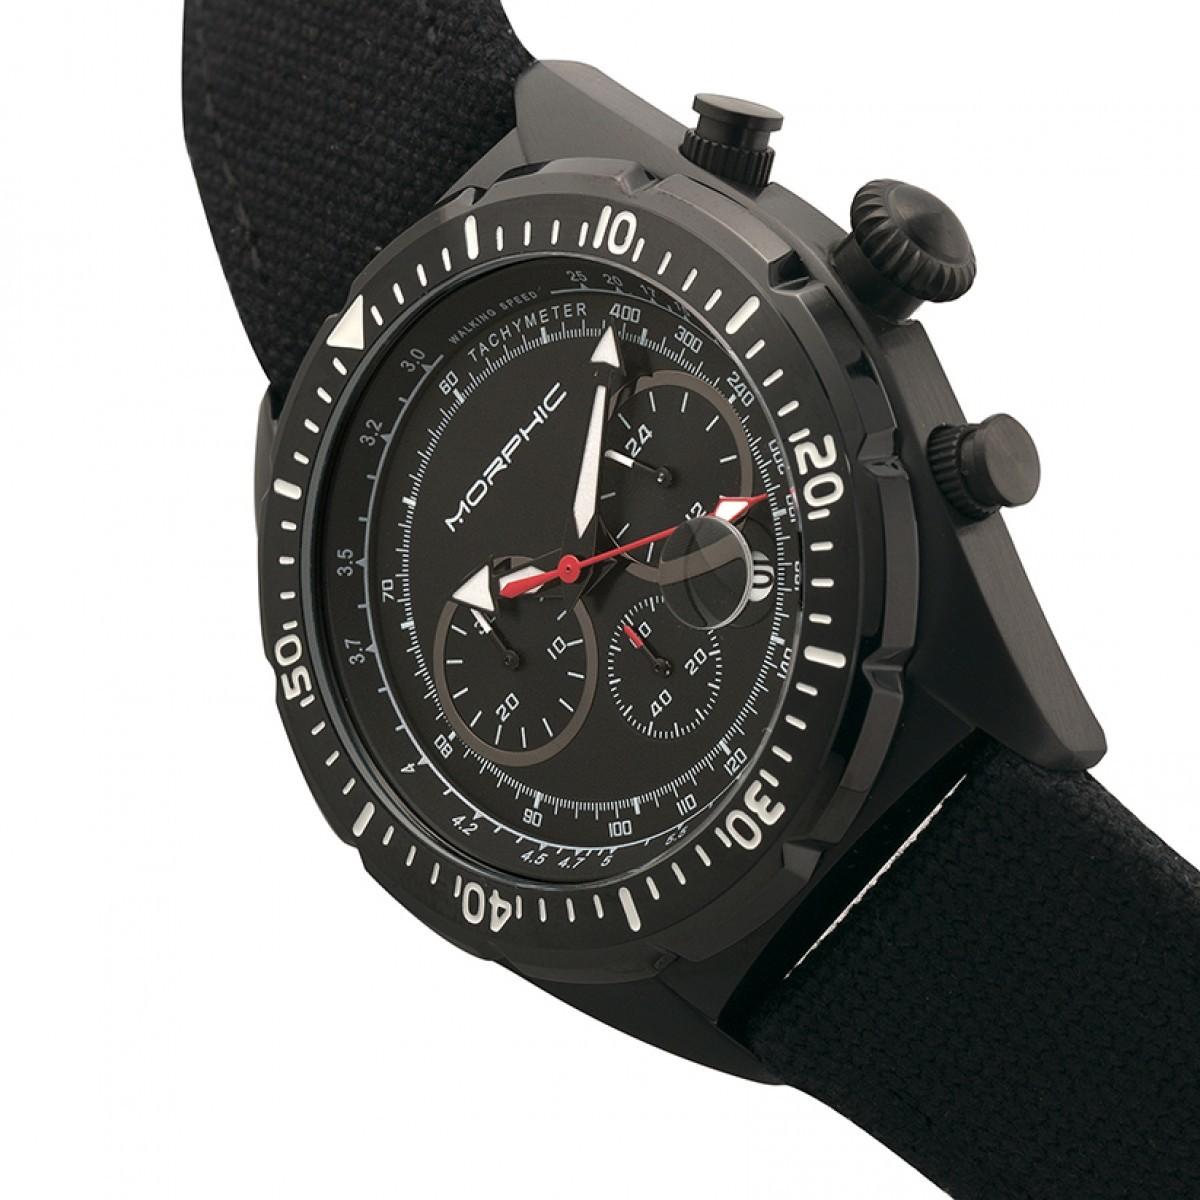 62f62c131 Morphic M53 Series Chronograph Fiber-Weaved Leather-Band Watch w/Date -  Black